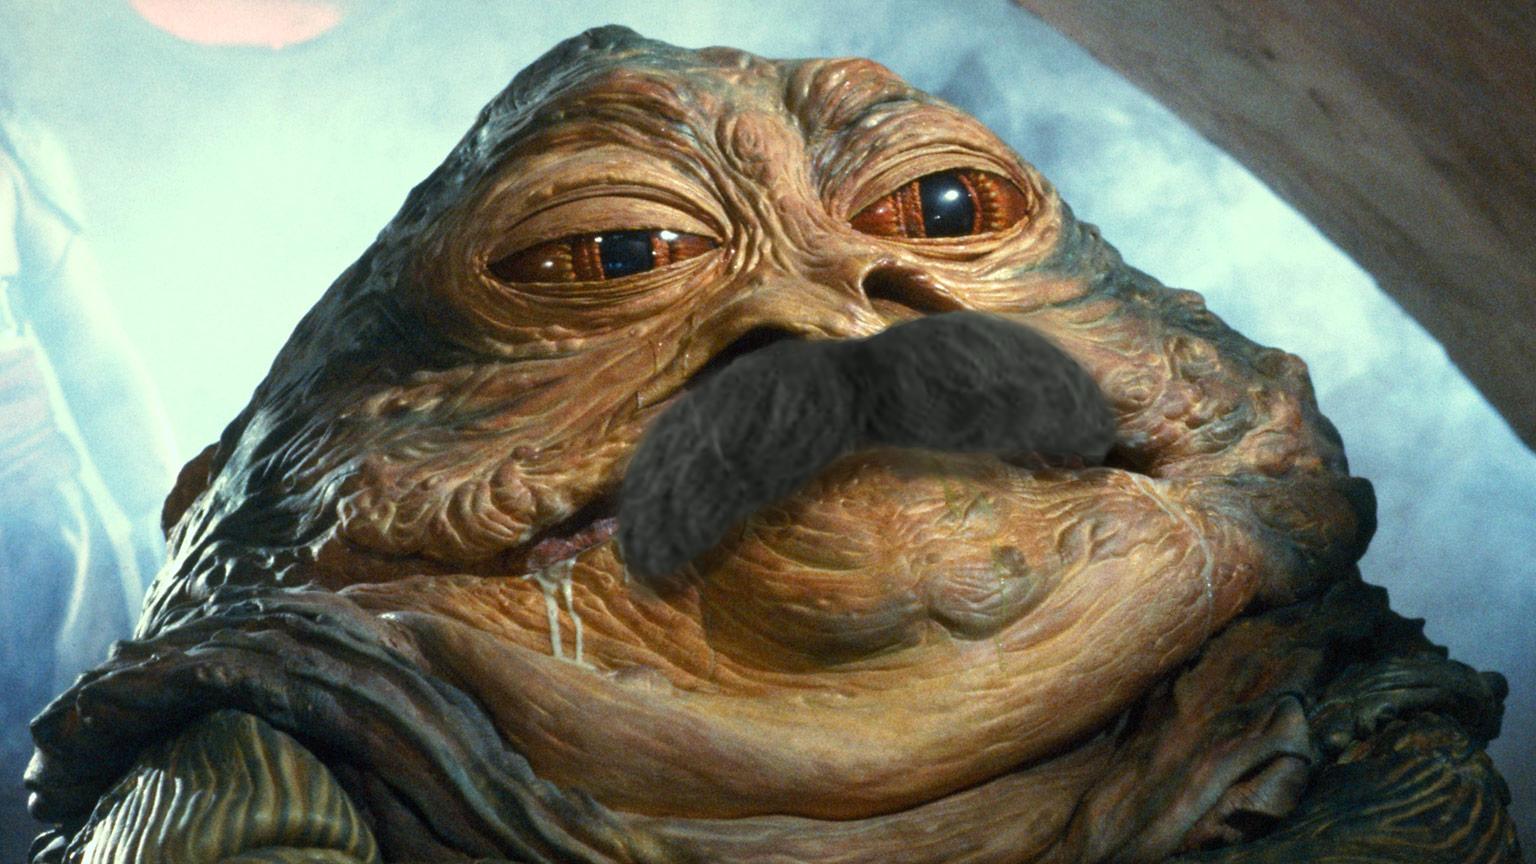 Star Wars A Full Moustache New Hope Jabba The Hutt Starwars Rogueone Sw Givethatdroidapropermoustache Moustac Jabba The Hutt Star Wars Facts The Hutt